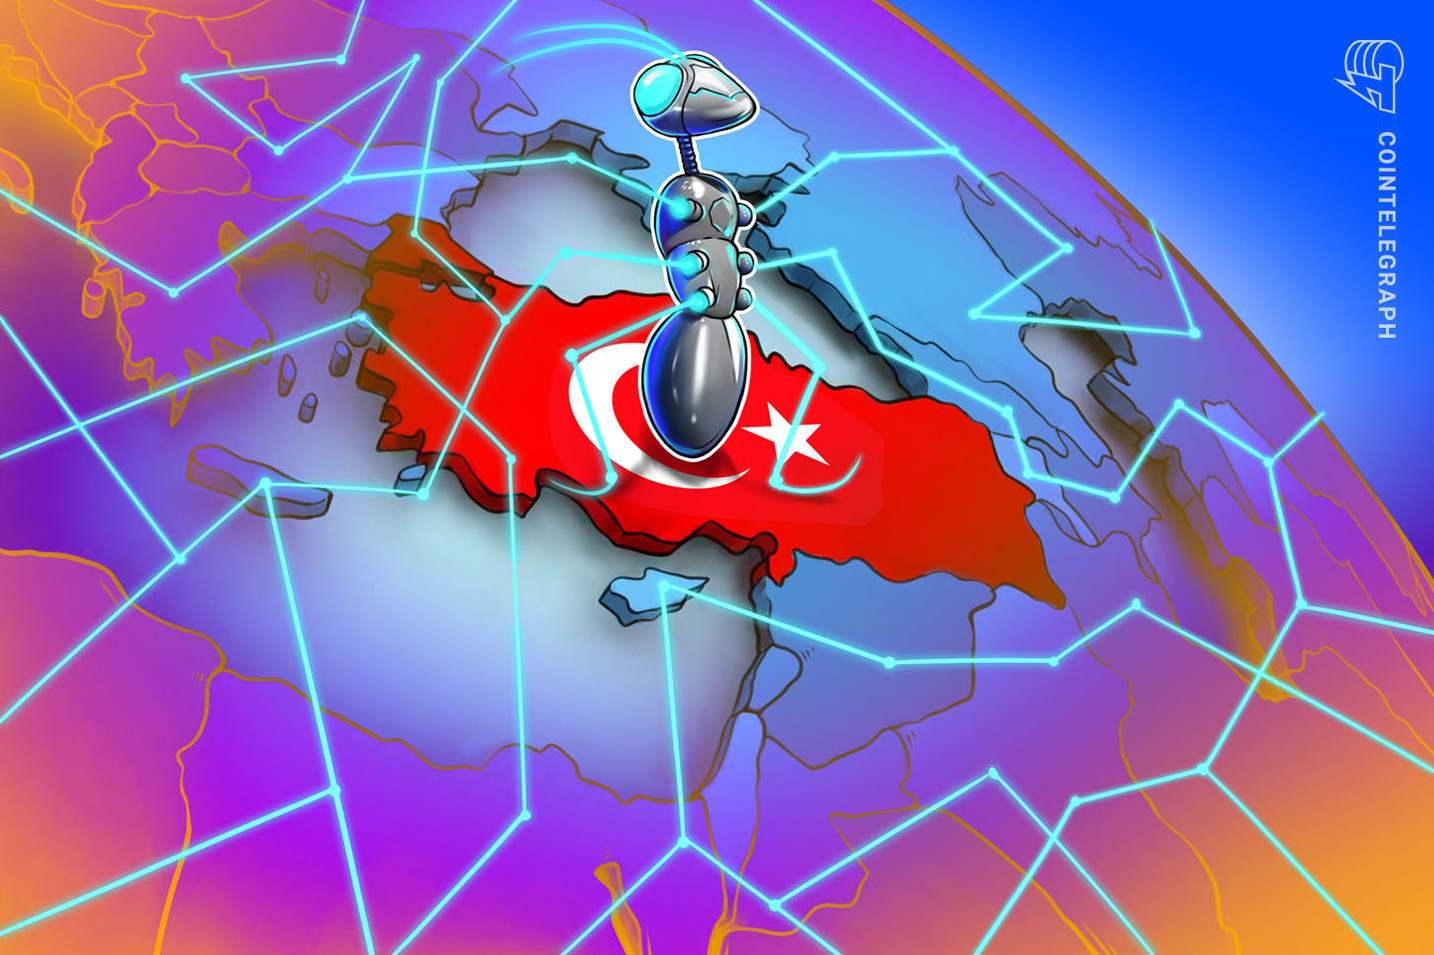 Turkey Taking Center Stage in the World of Blockchain in 2020